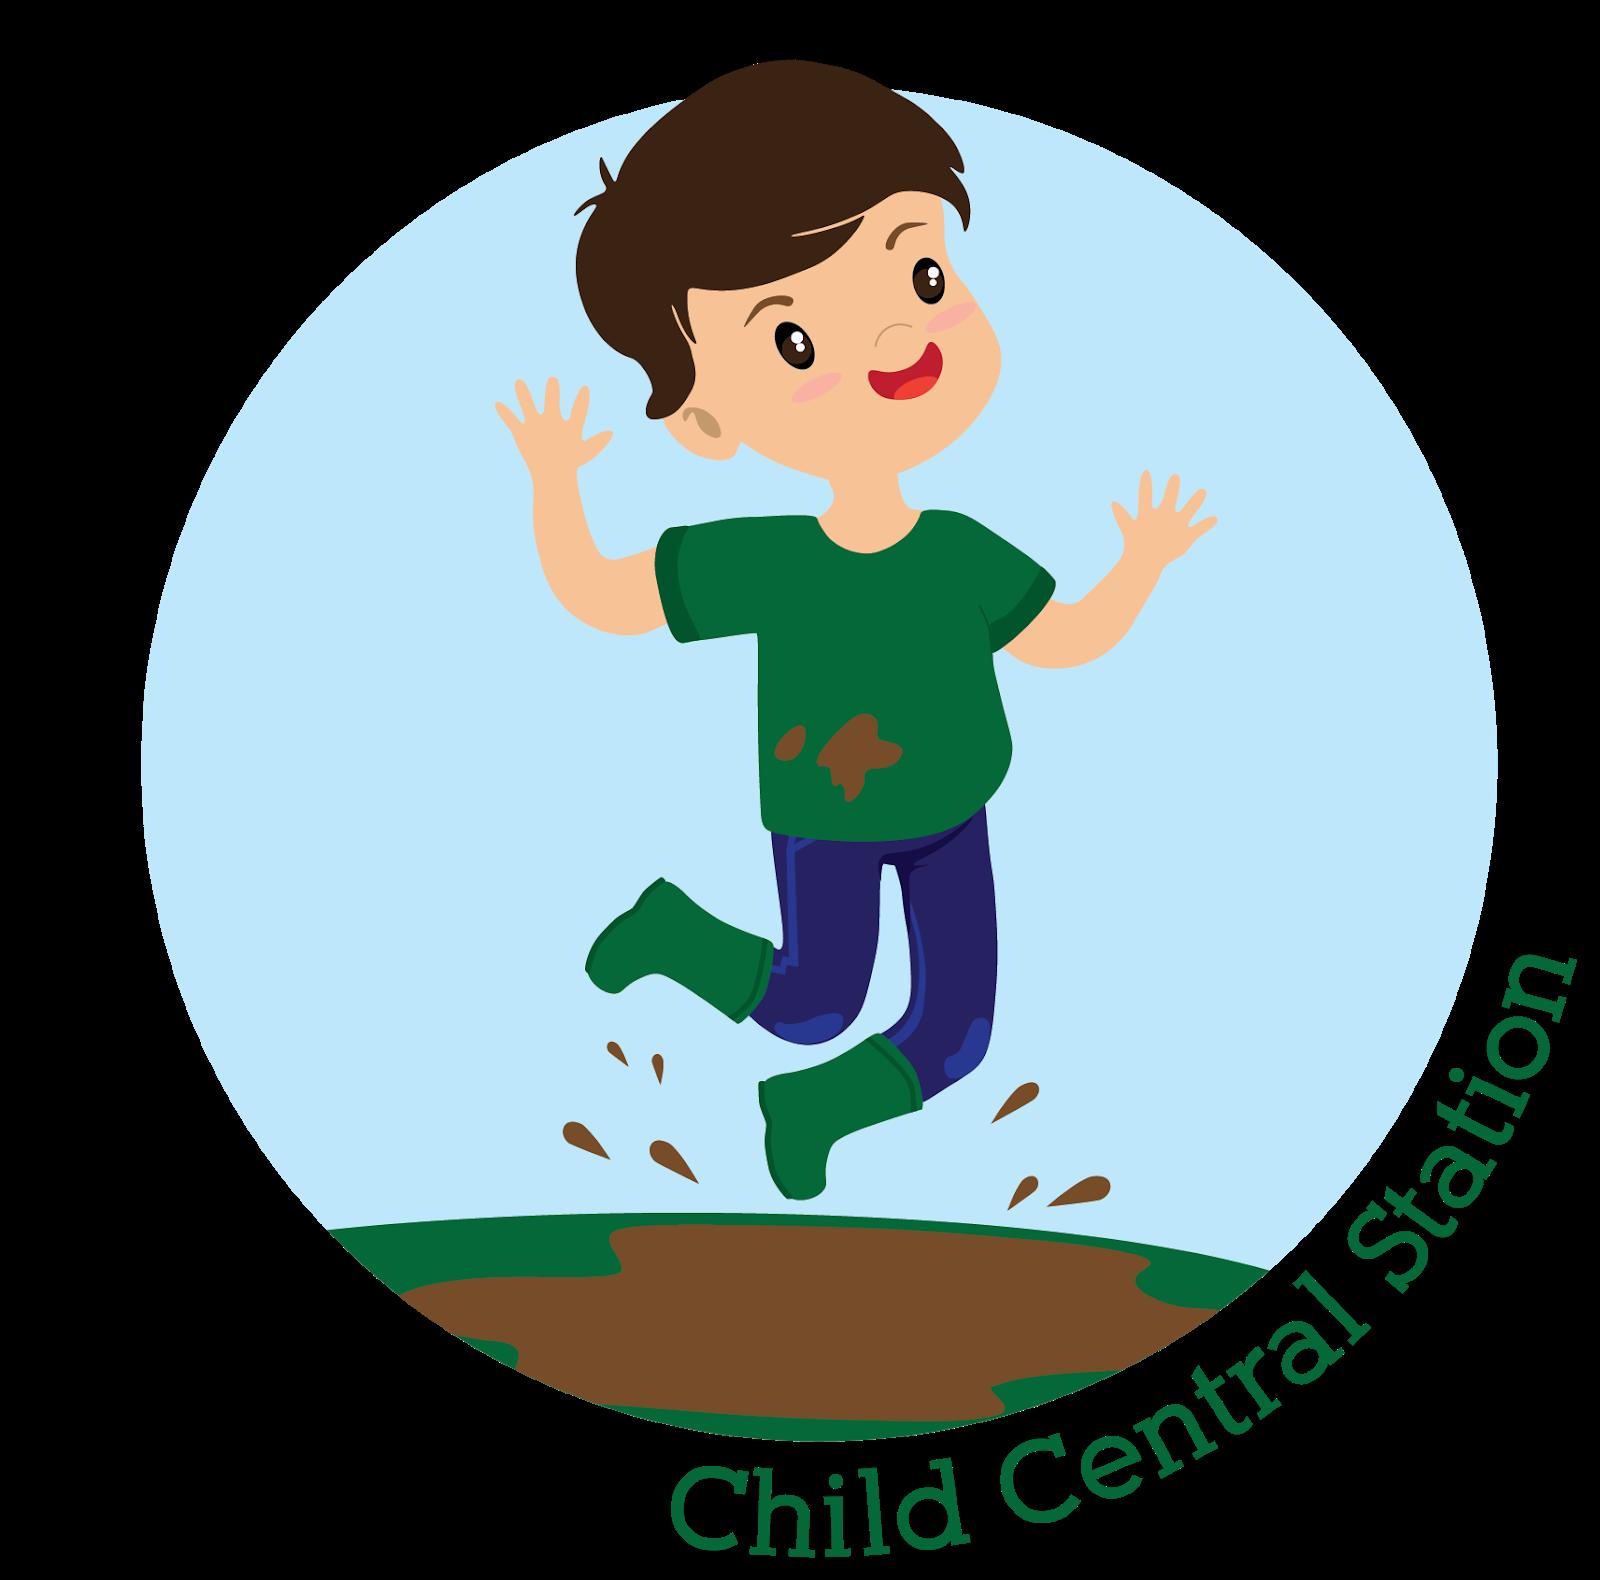 Child Central Station Licensed Group Daycare